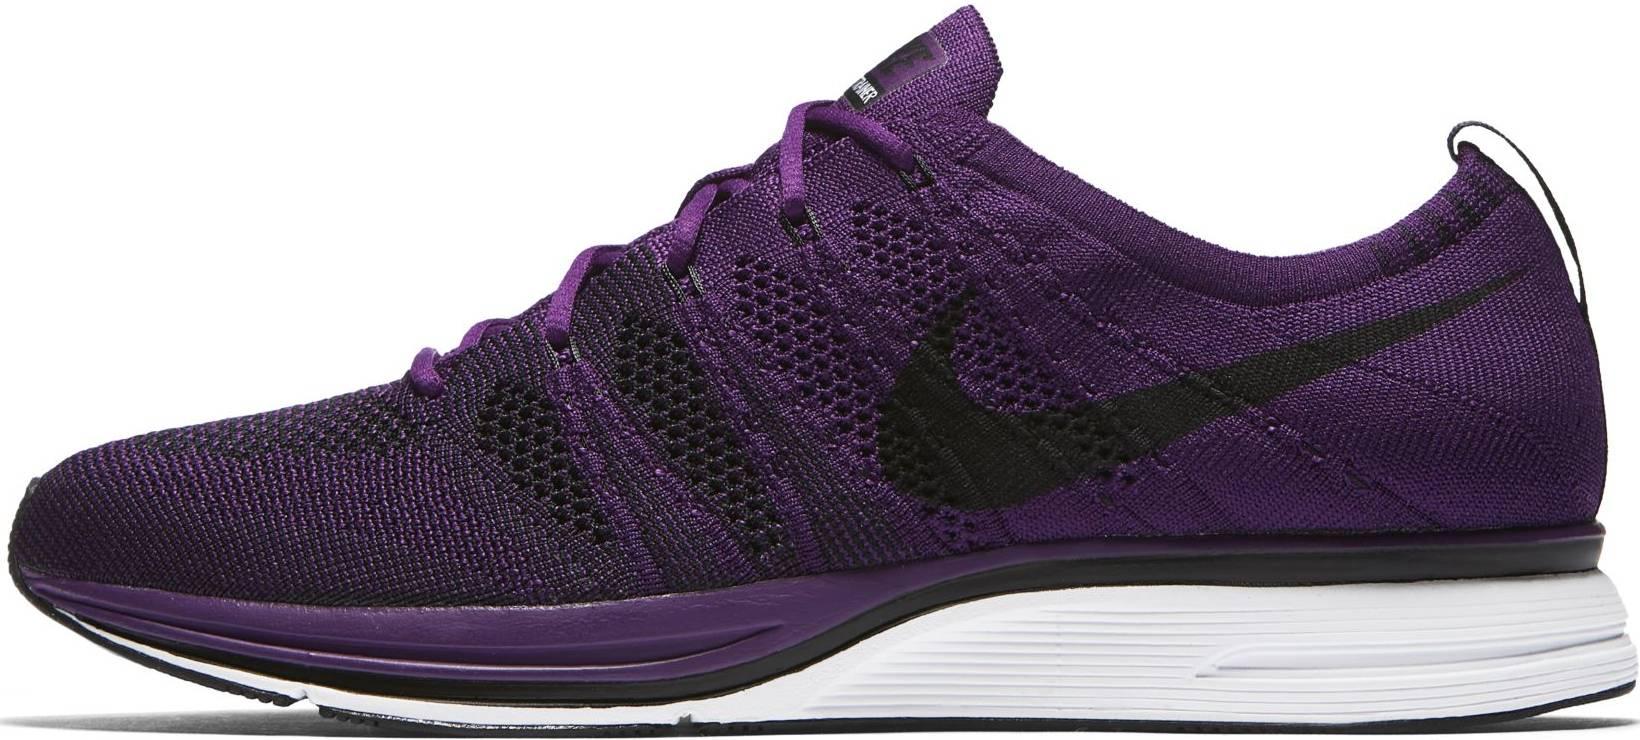 Save 28% on Purple Sneakers (180 Models